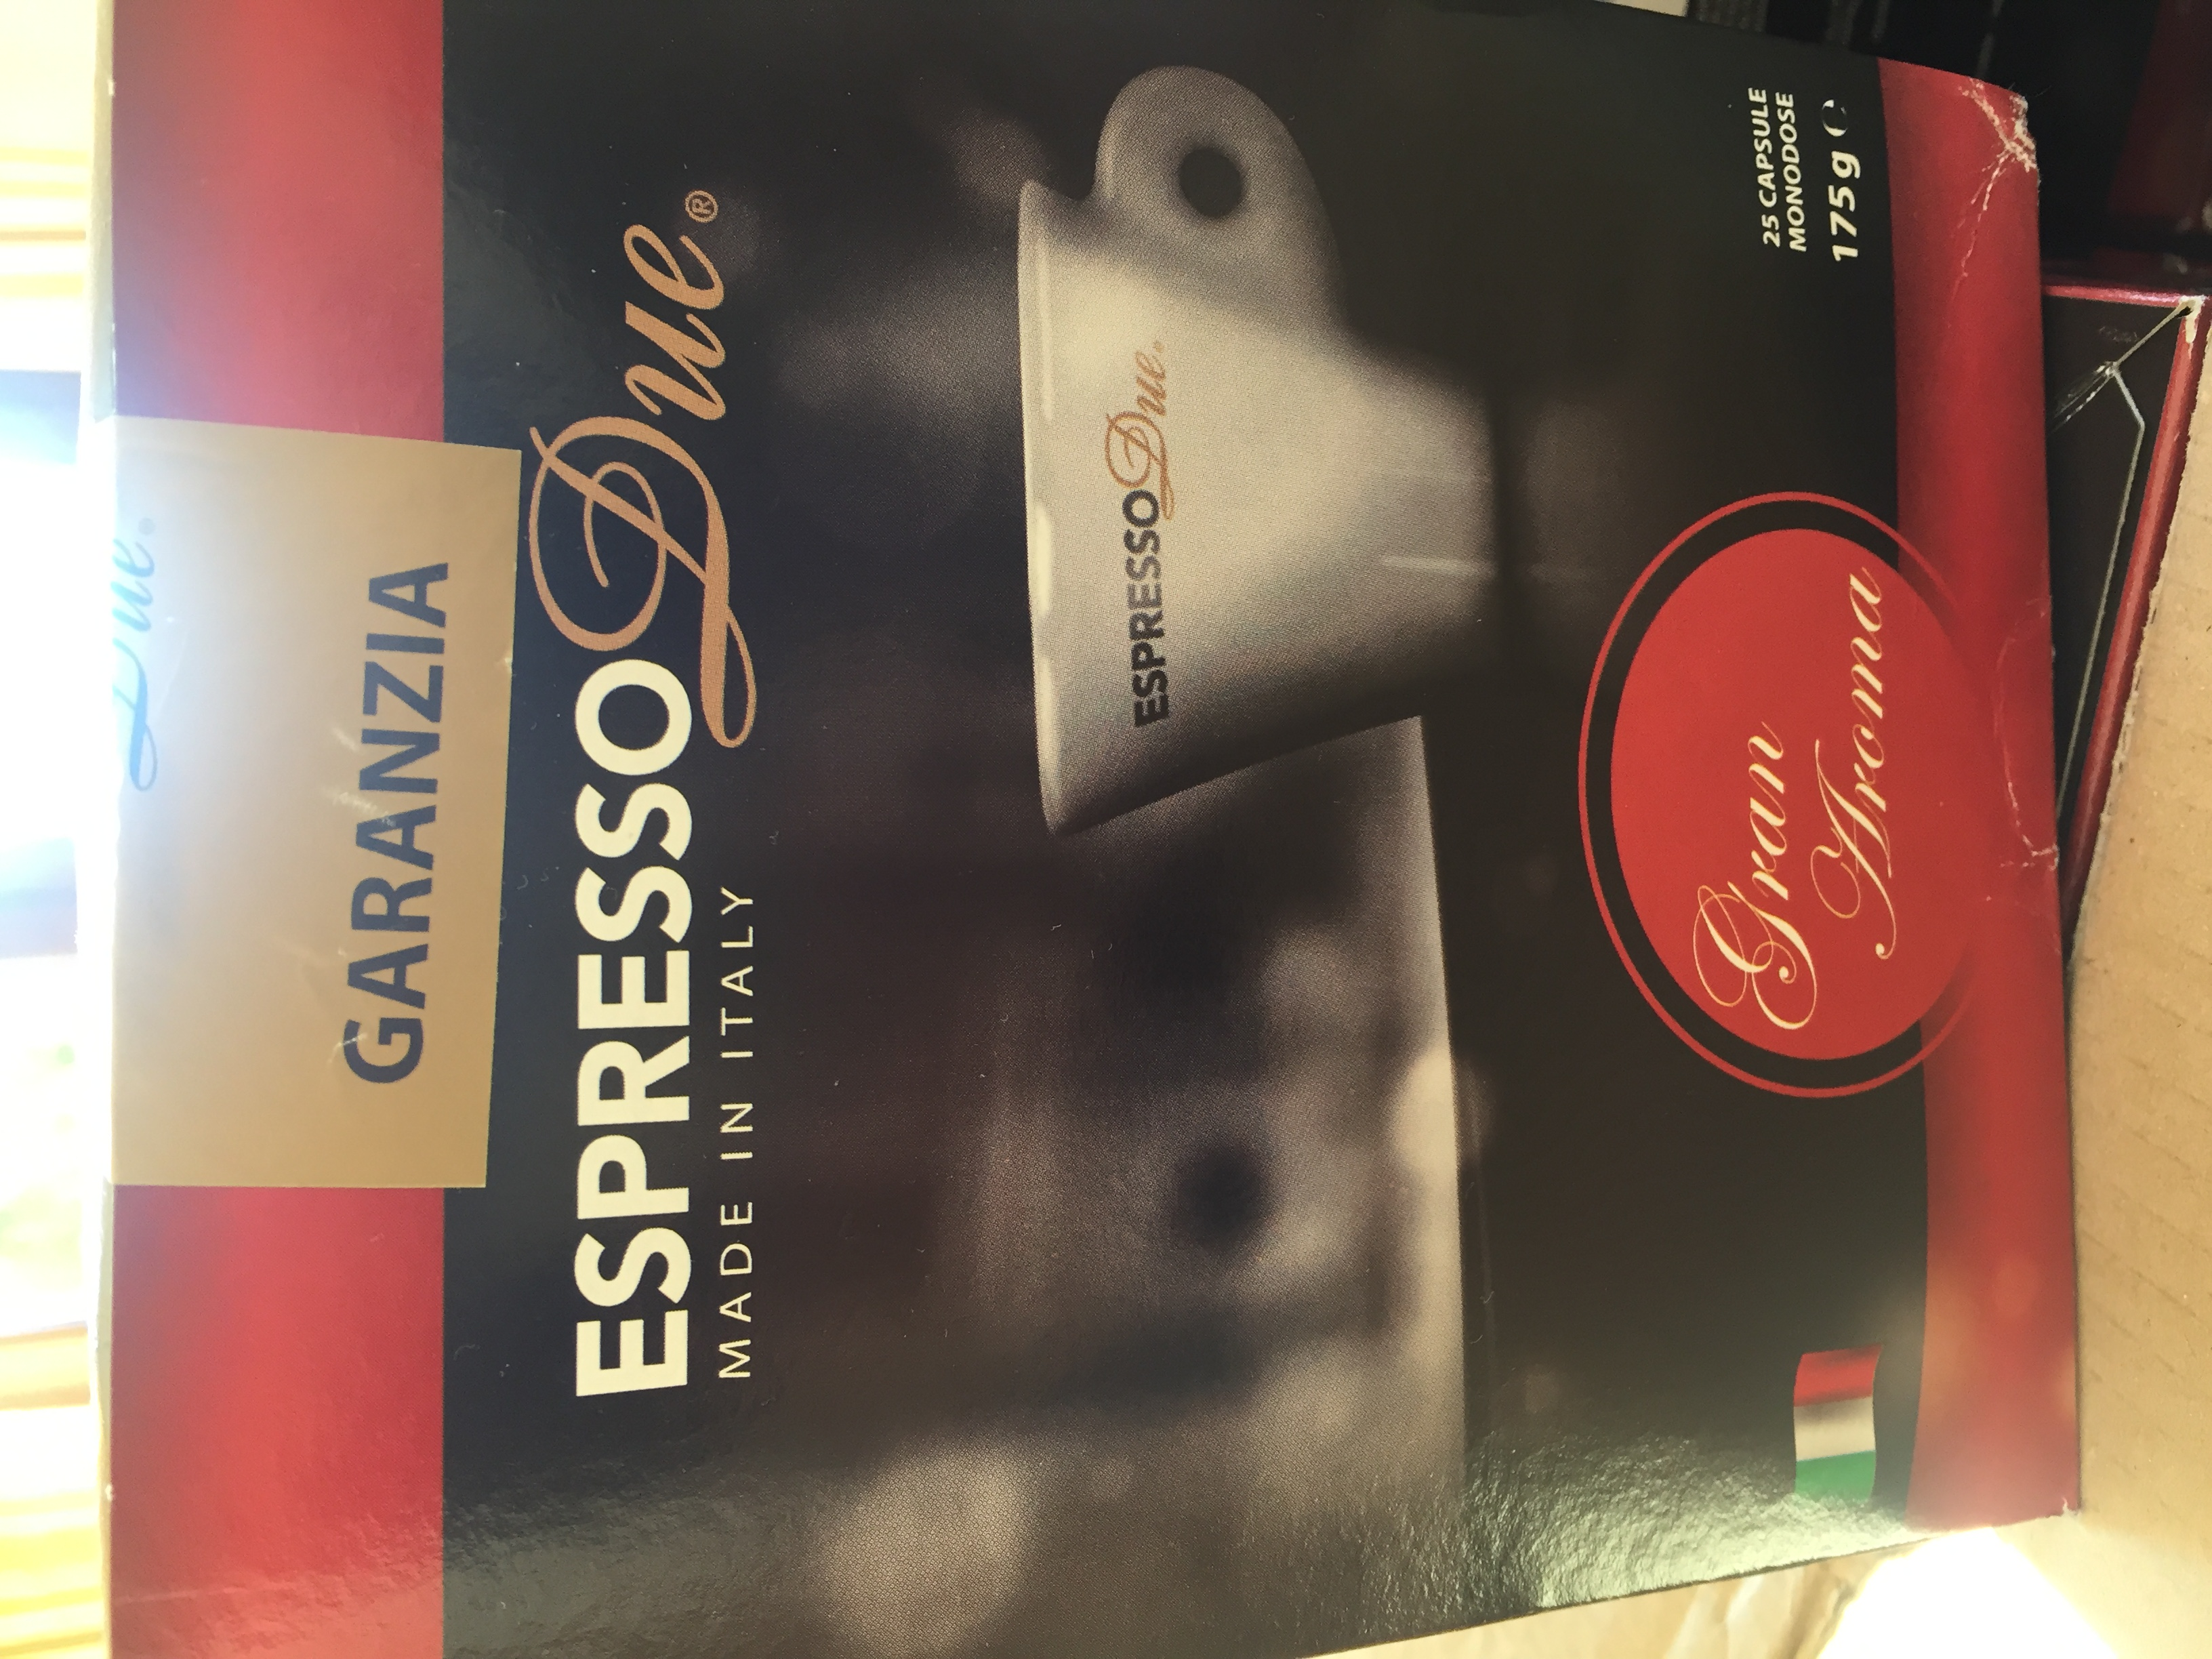 Capsule caffe'espressoDue